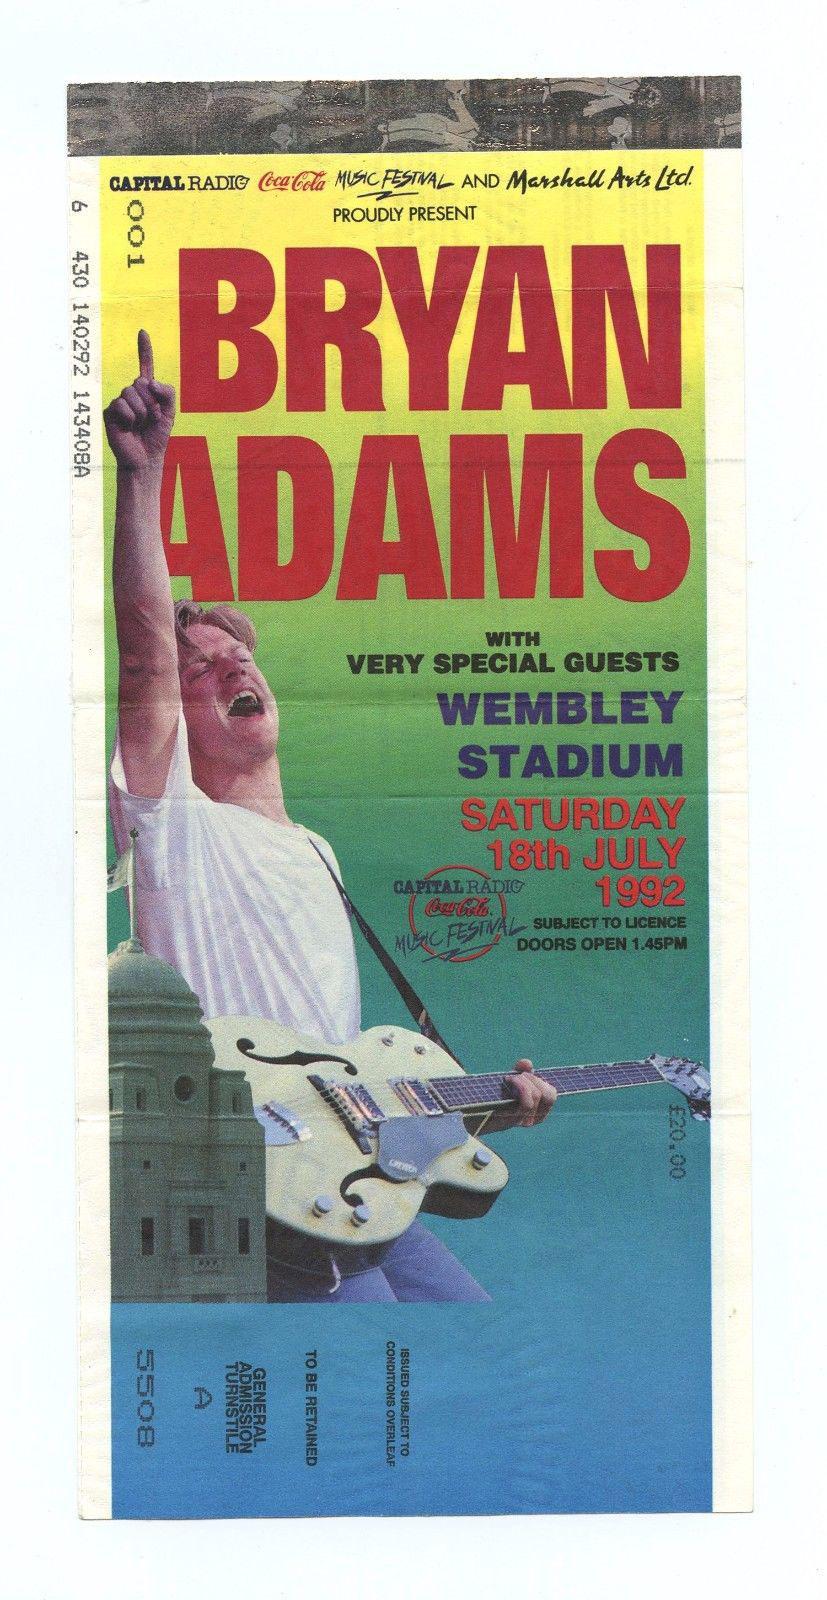 Bryan Adams Ticket 1992 Jul 18 Wembley Stadium London UK Unused